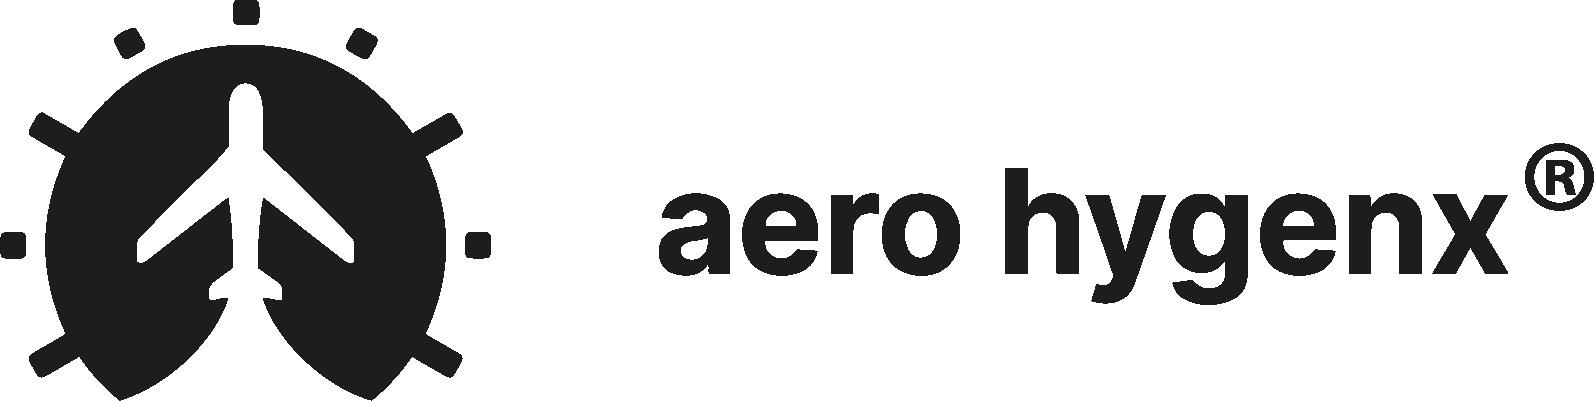 aero hygenx